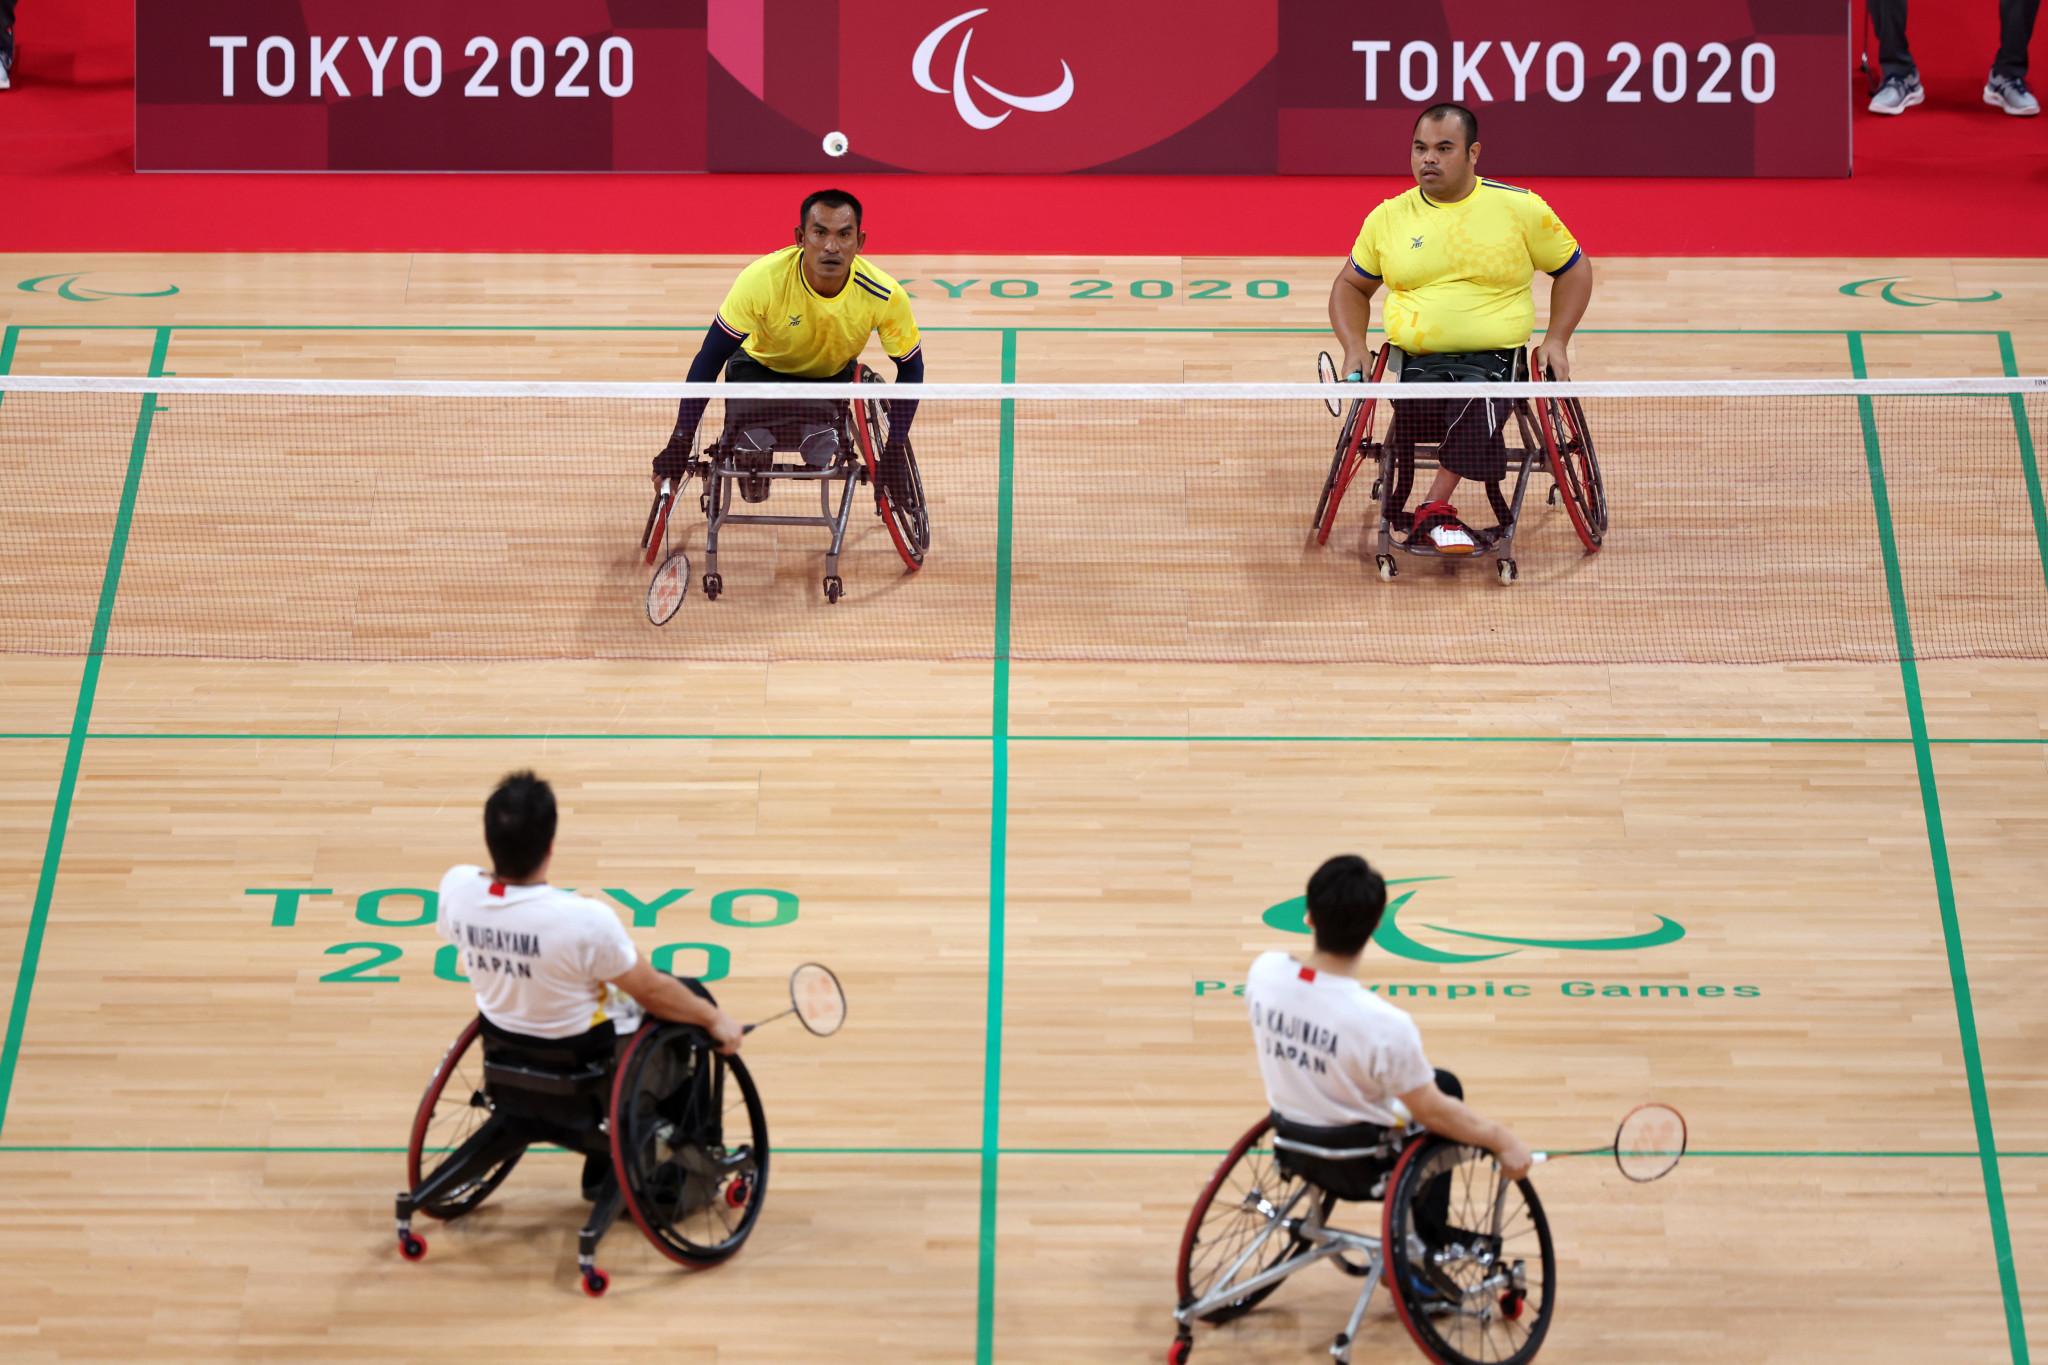 BWF eyes long-term Para badminton growth after Paralympic debut in Tokyo